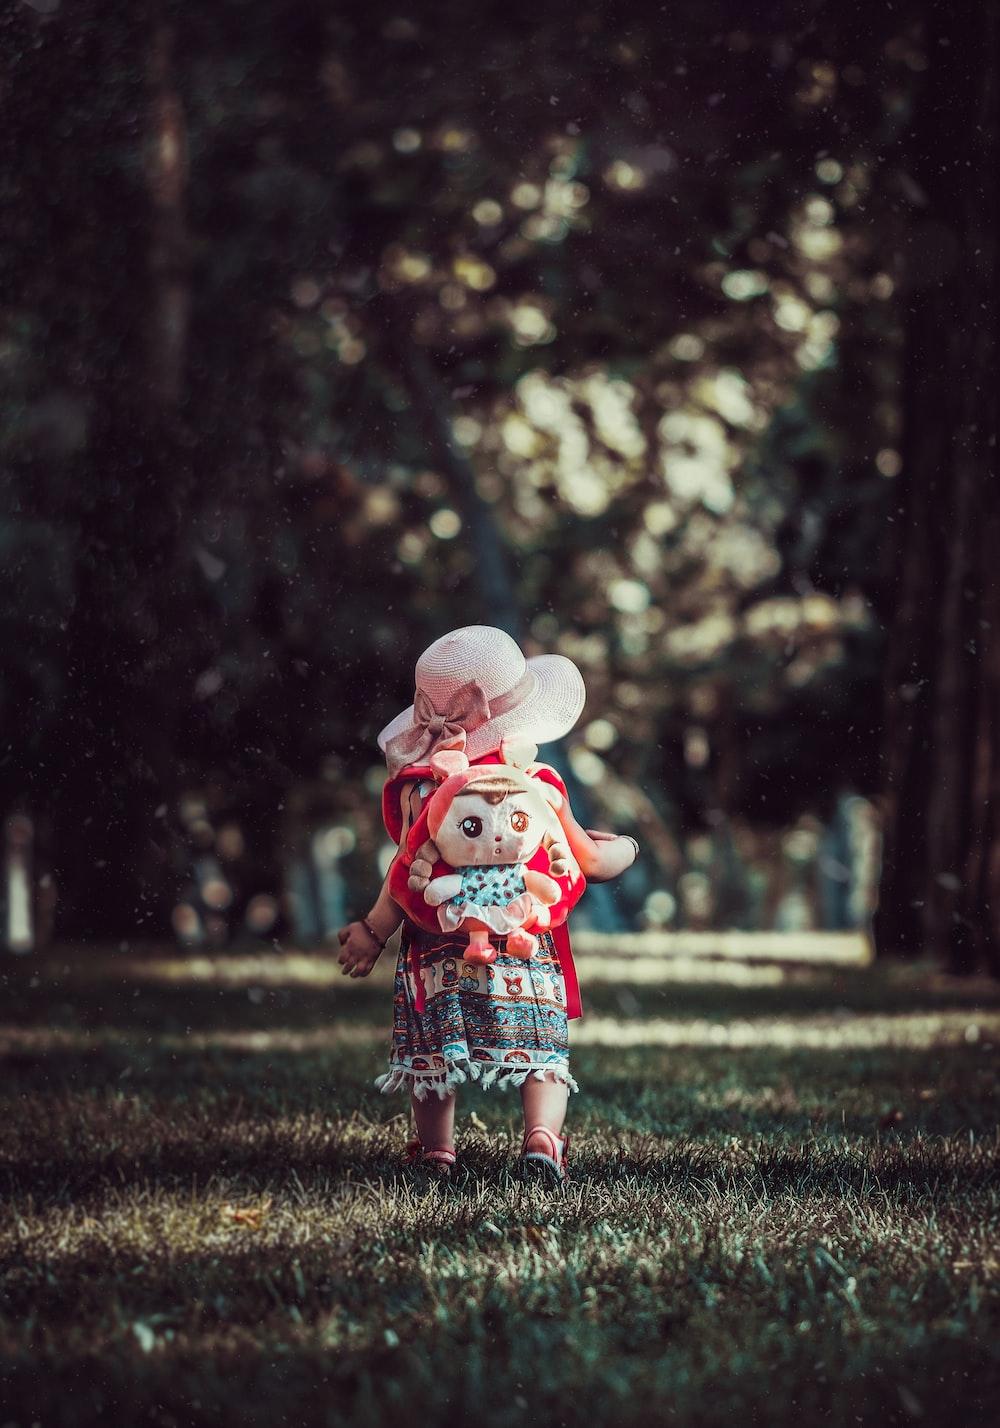 toddler wearing backpack walking near trees